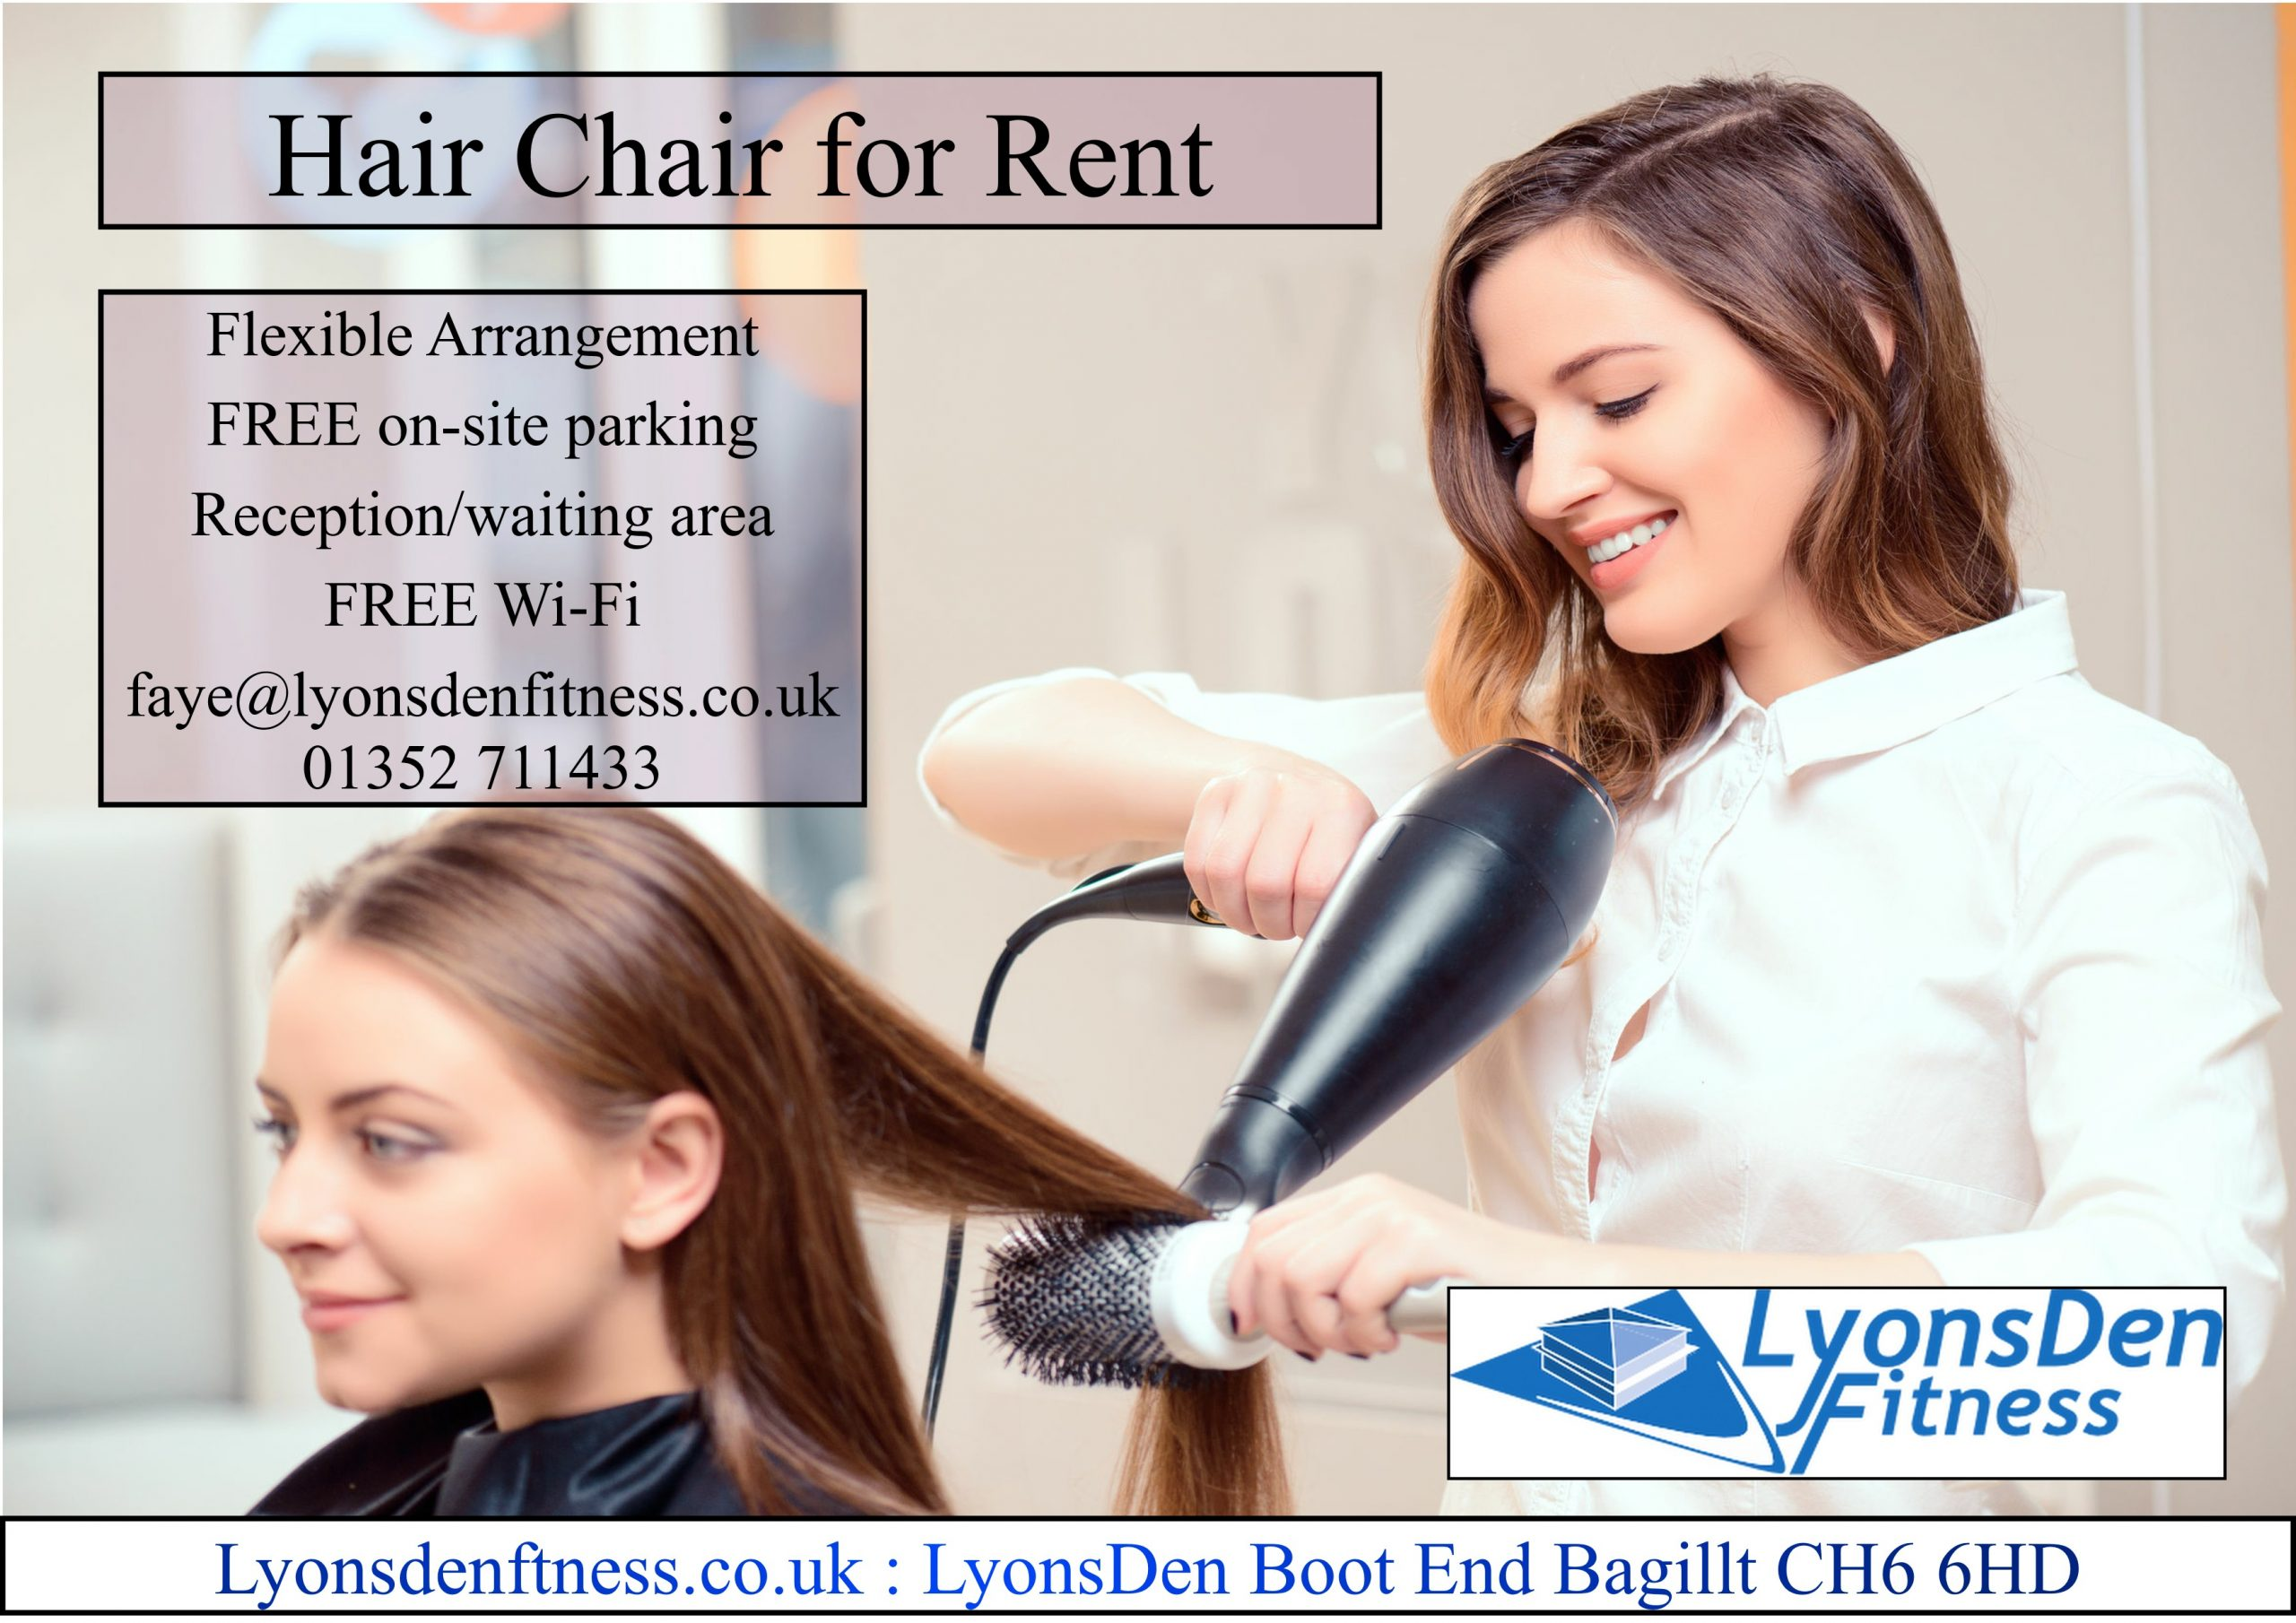 LyonsDen Hair Chair retal 2019